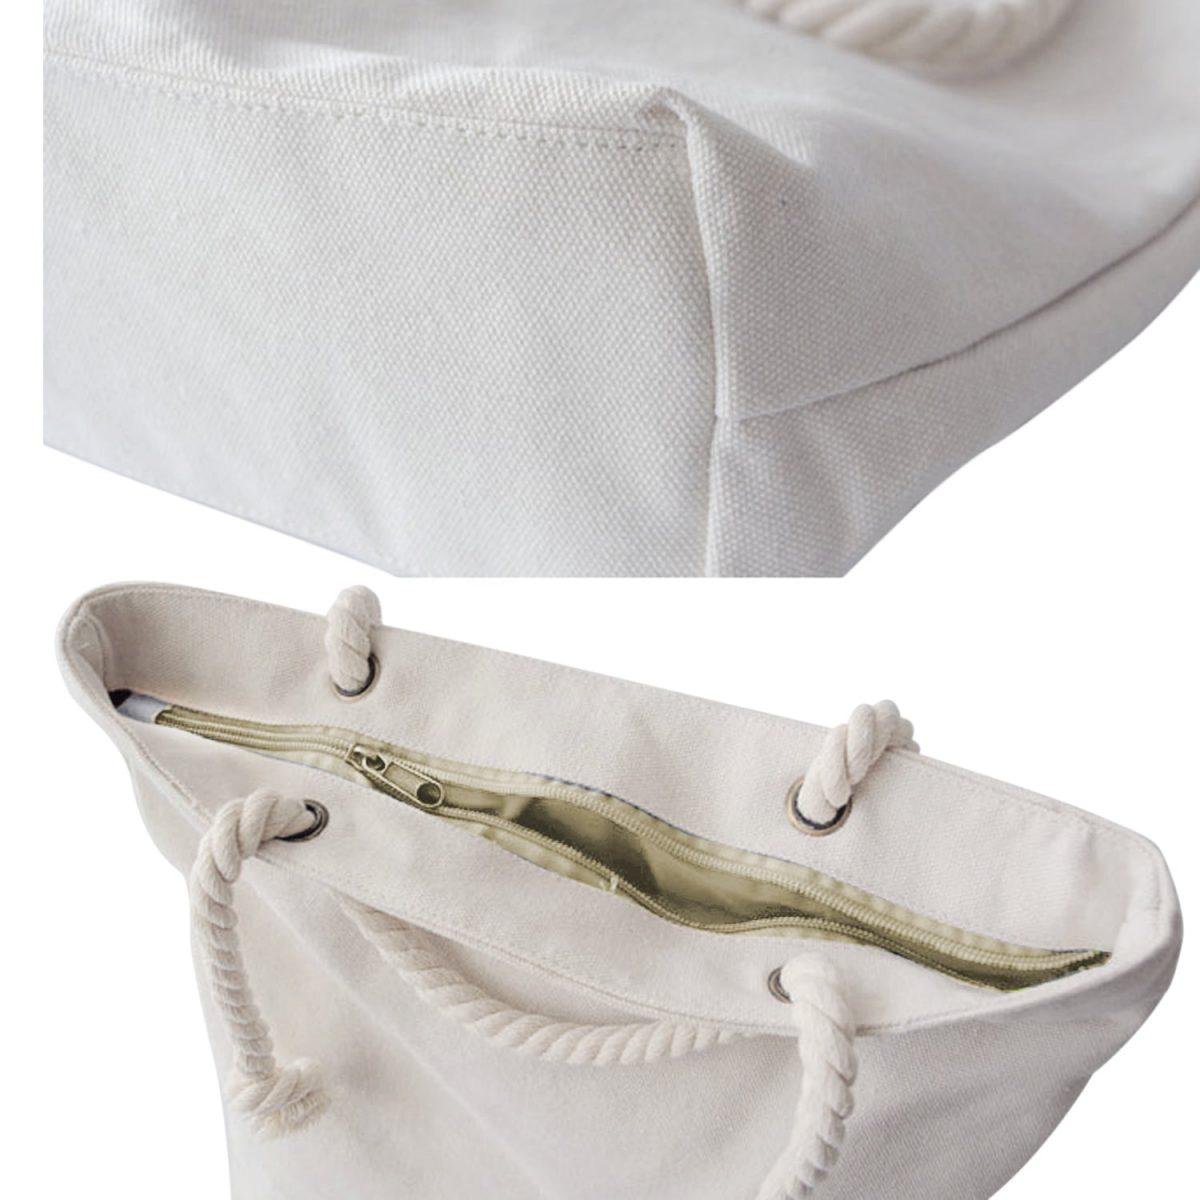 Love Uğurböceği Desenli Fermuarlı Modern Kumaş Çanta Realhomes